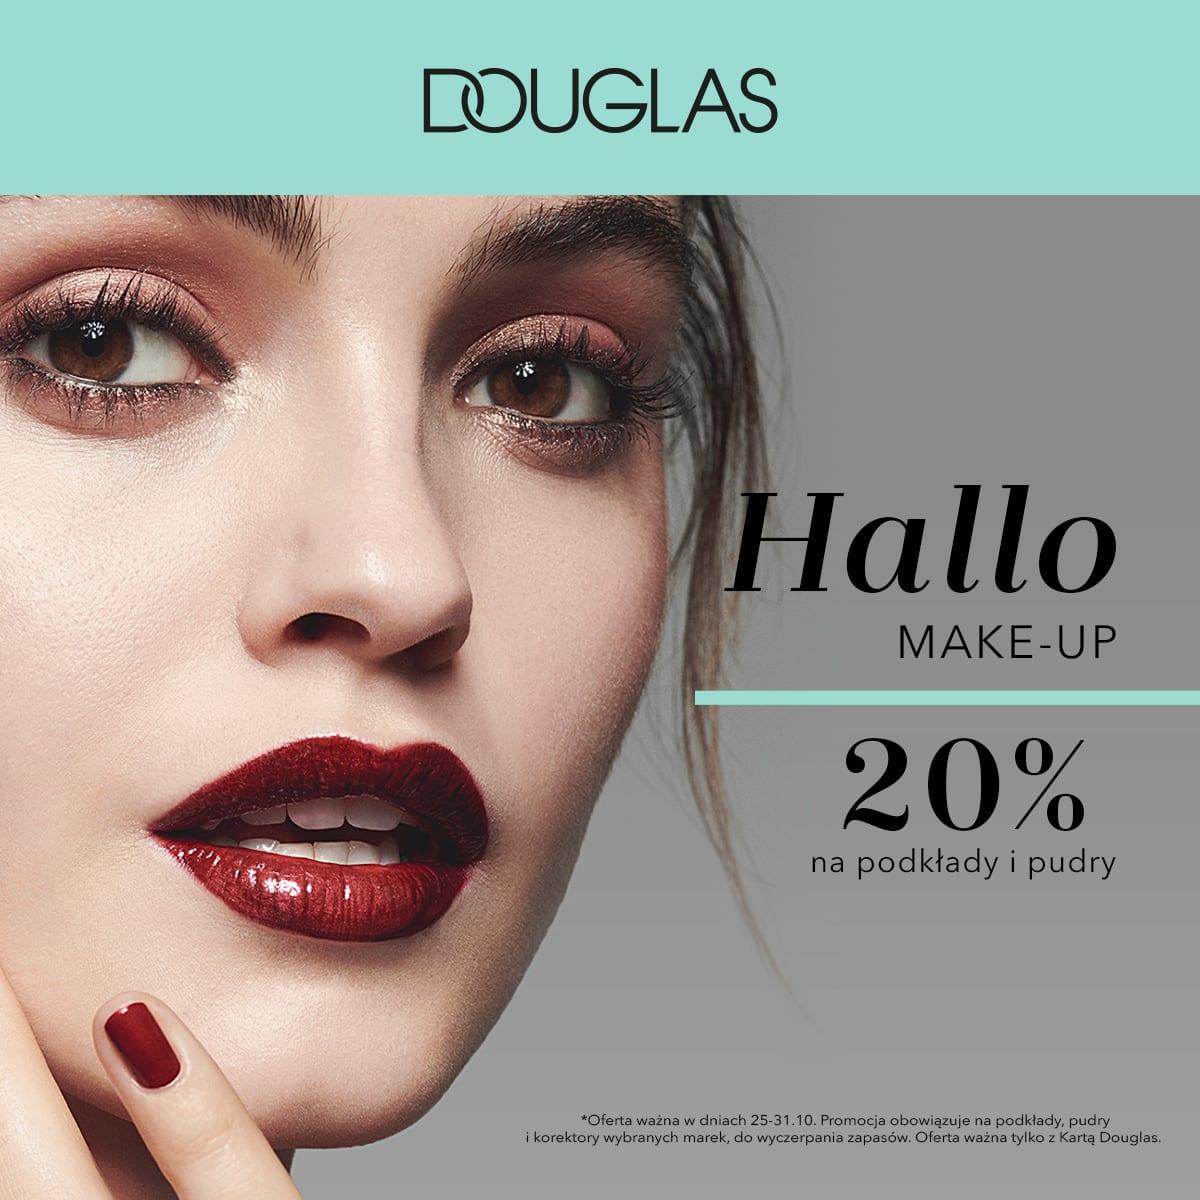 1200x1200_Douglas_Hallo_MakeUp